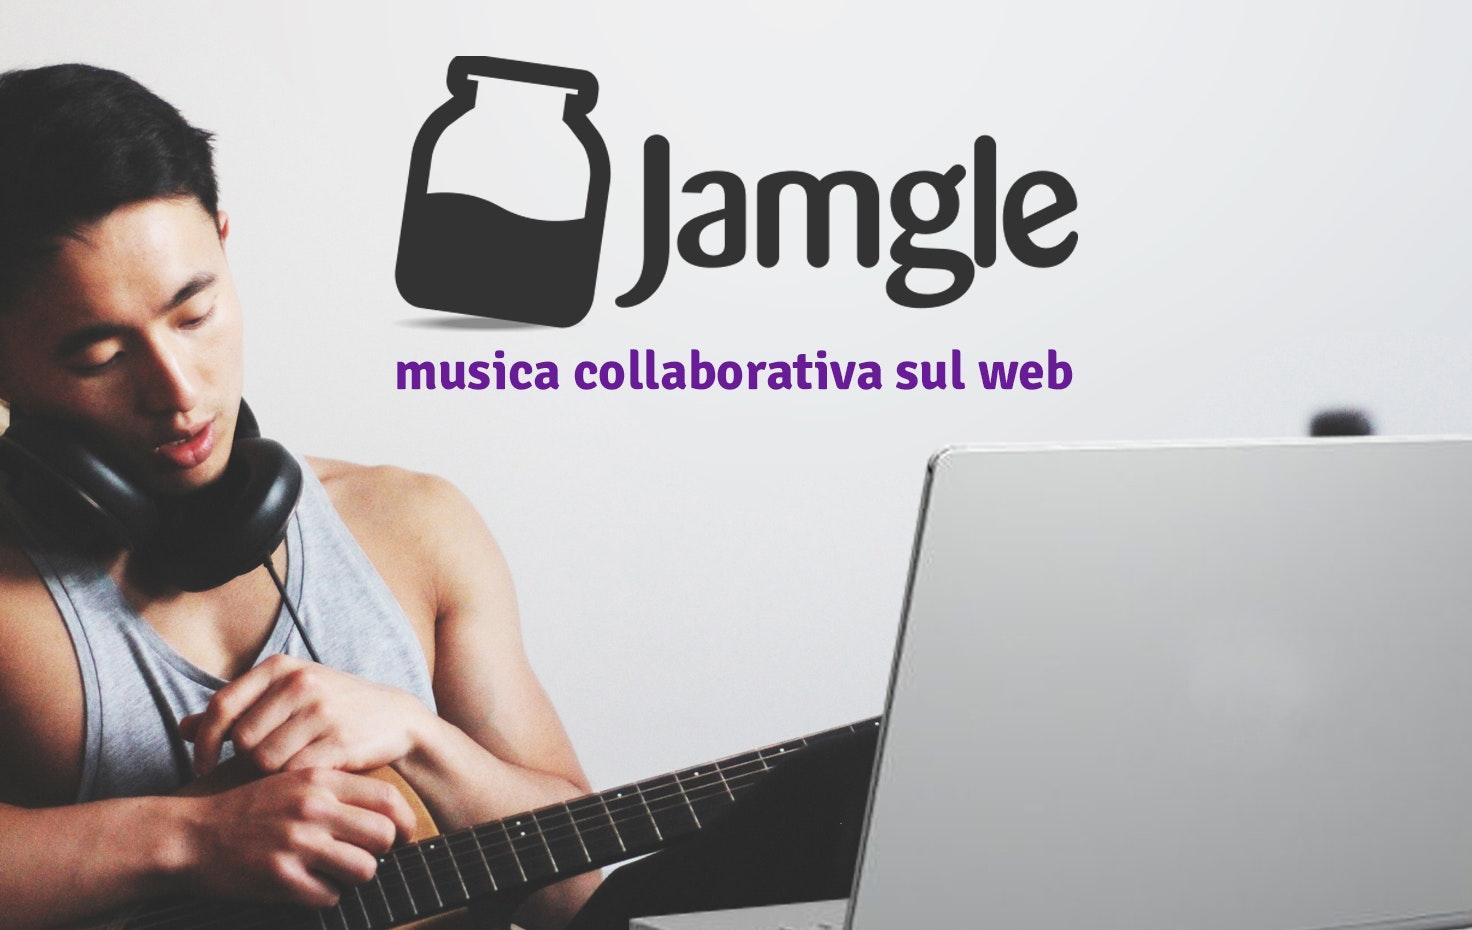 Jamgle: musica collaborativa sul web